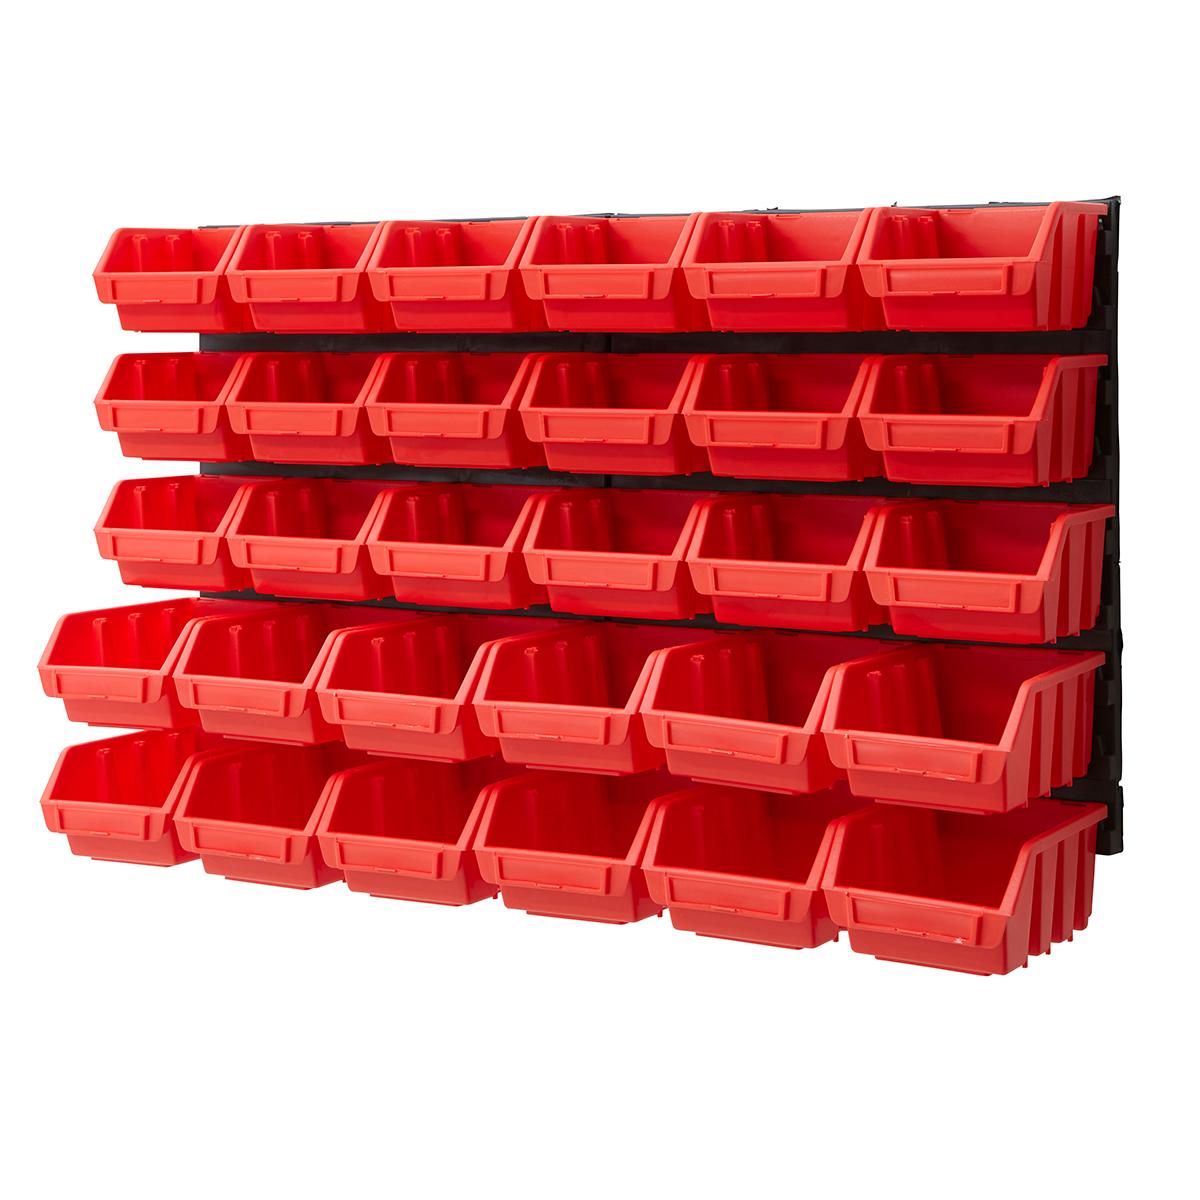 Part Storage For Garages : Plastic bin kit wall garage storage parts bins tool diy